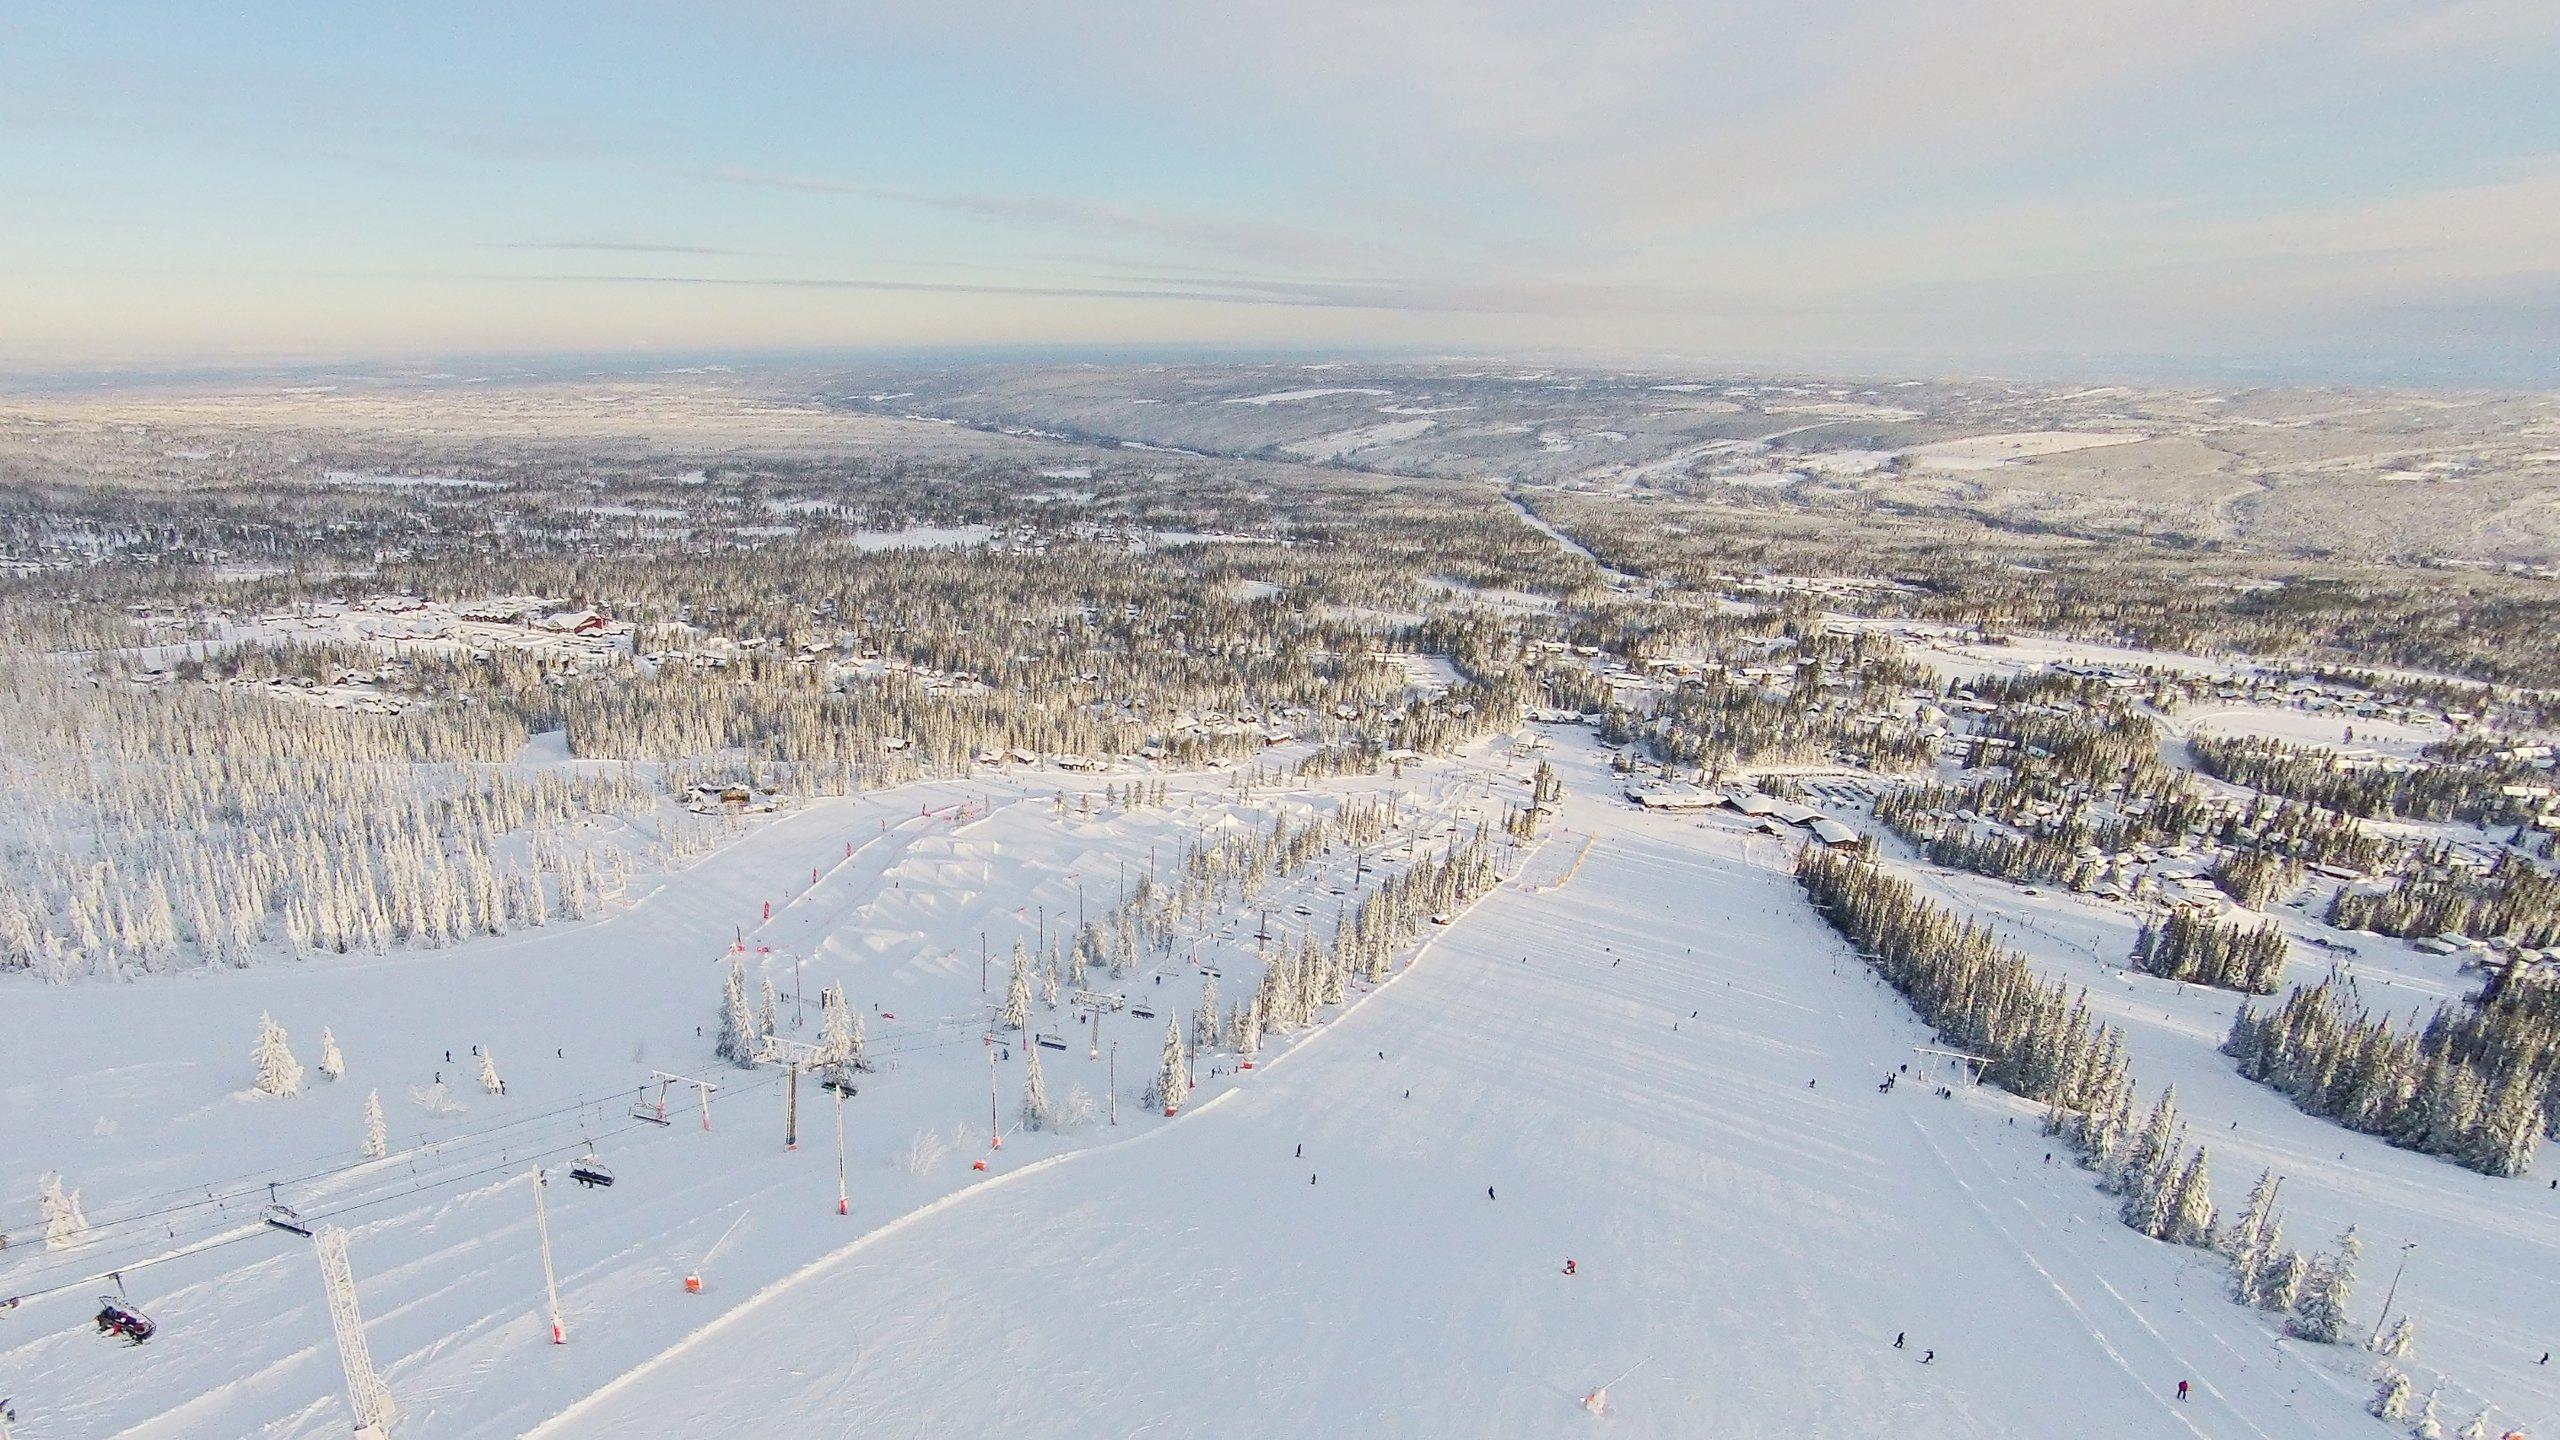 Malung-Sälen Municipality, Dalarna County, Sweden